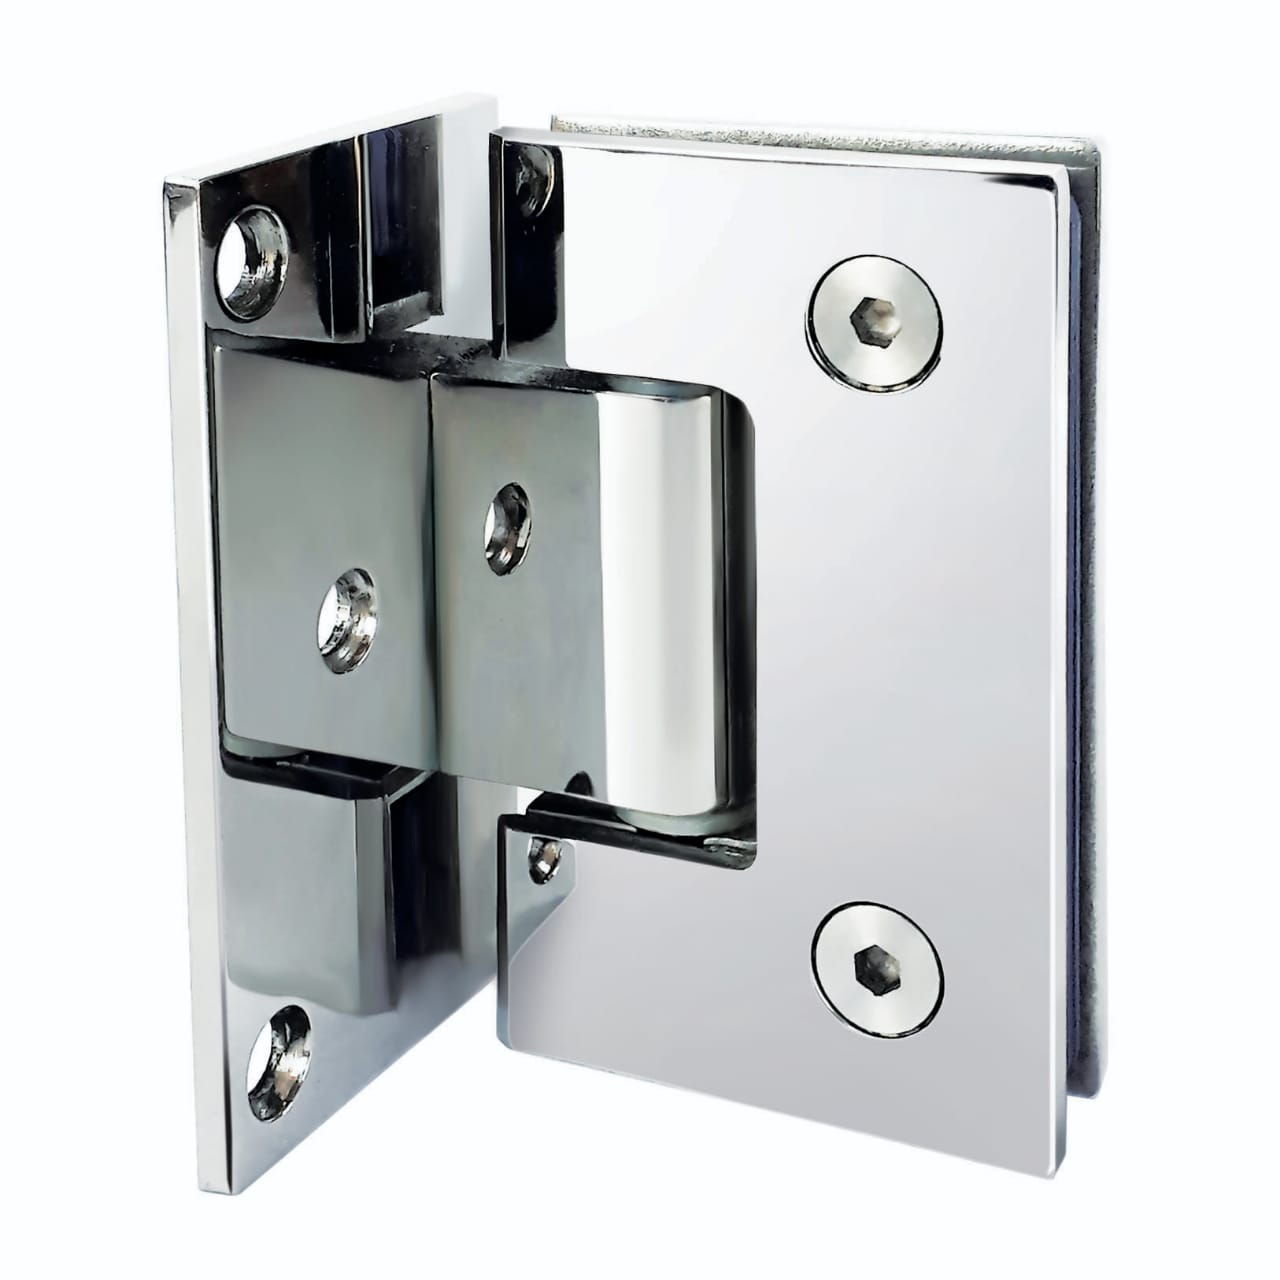 Dobradiça inox GV48 90º 1012 para porta de vidro e box - vidro/alvenaria 10 un